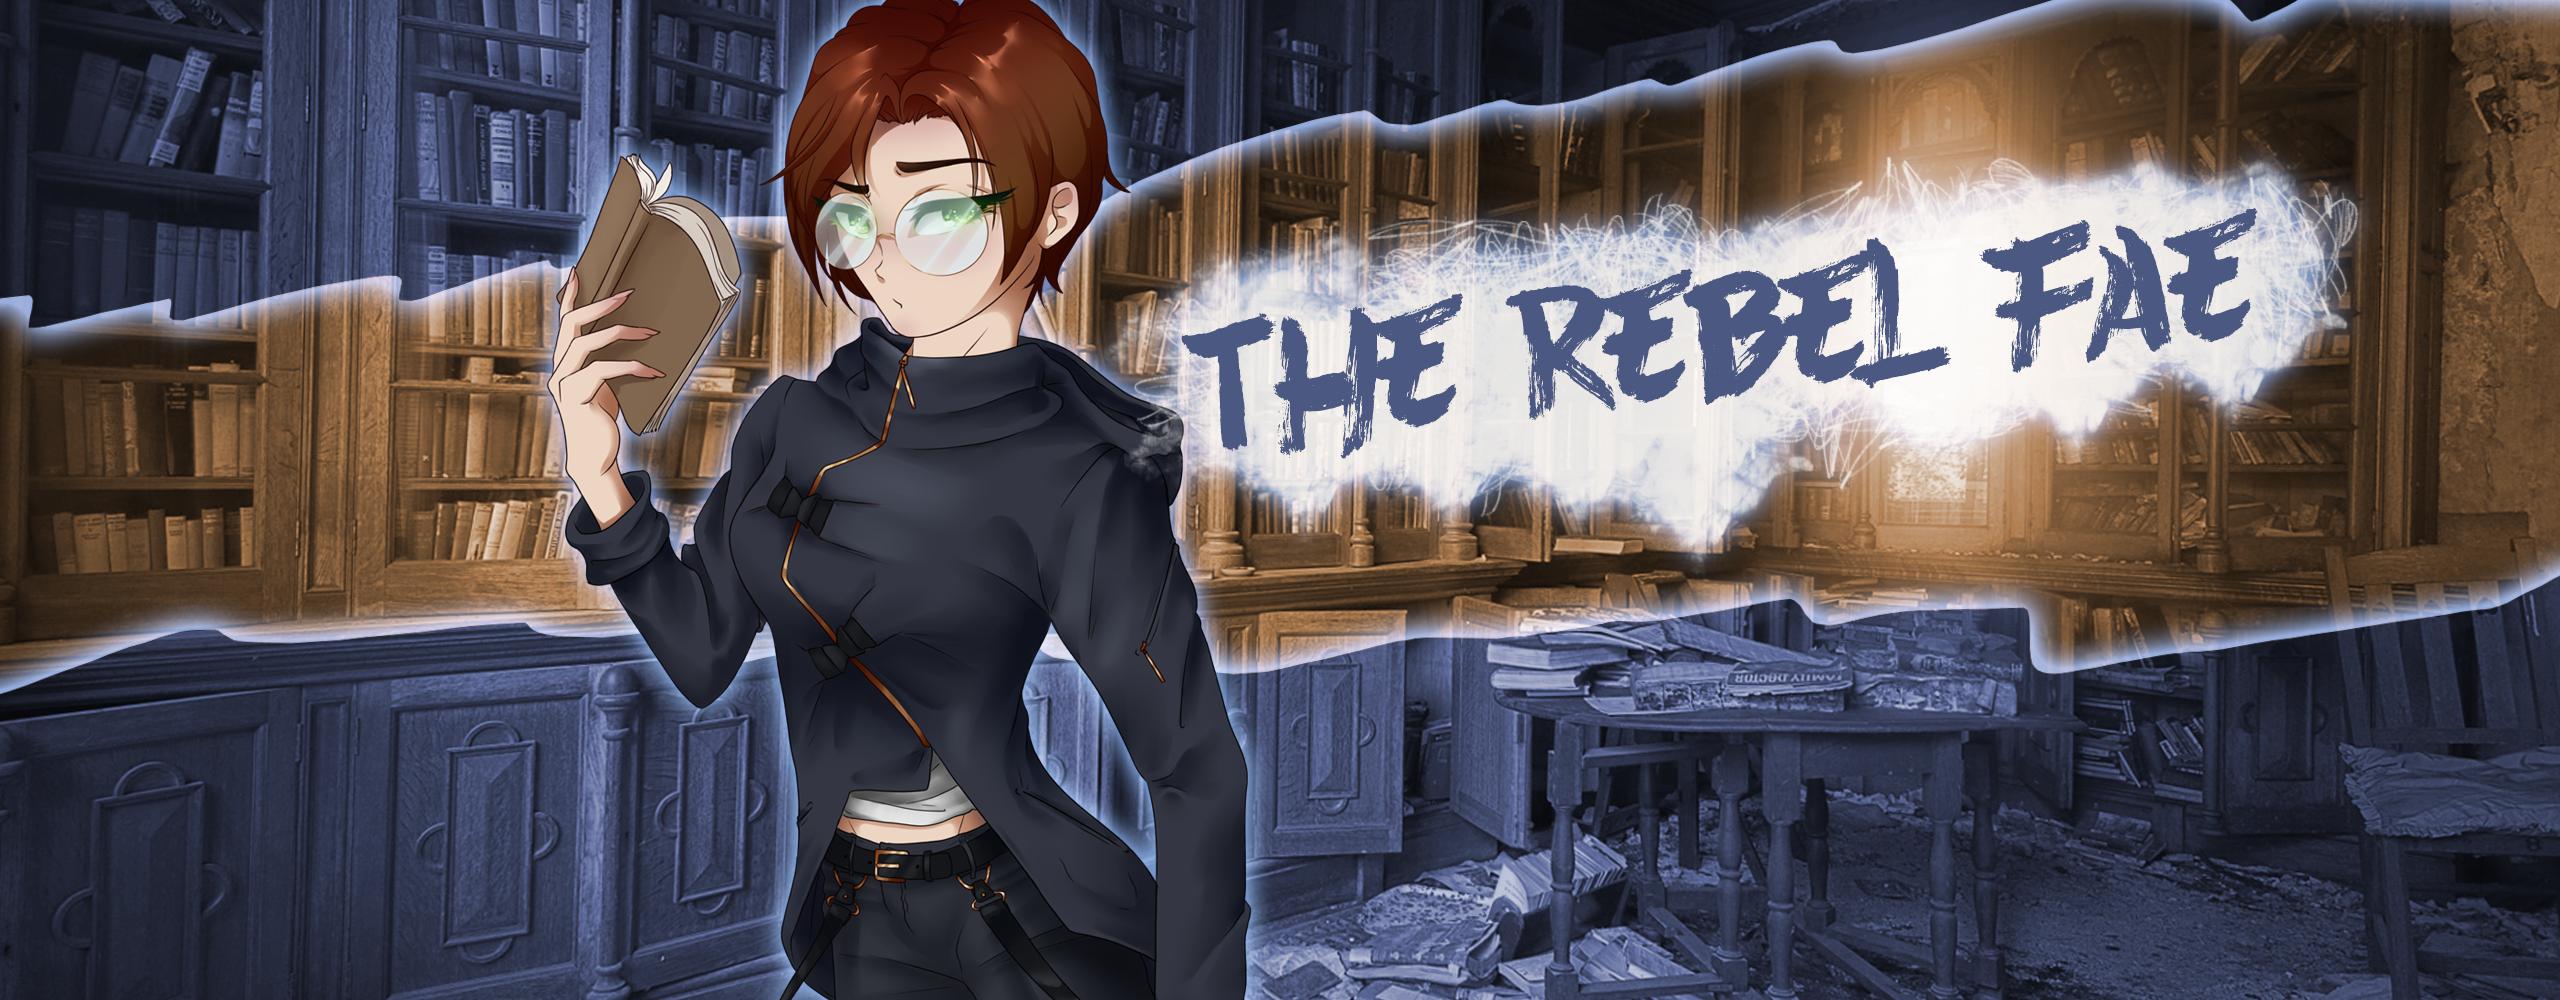 The Rebel Fae